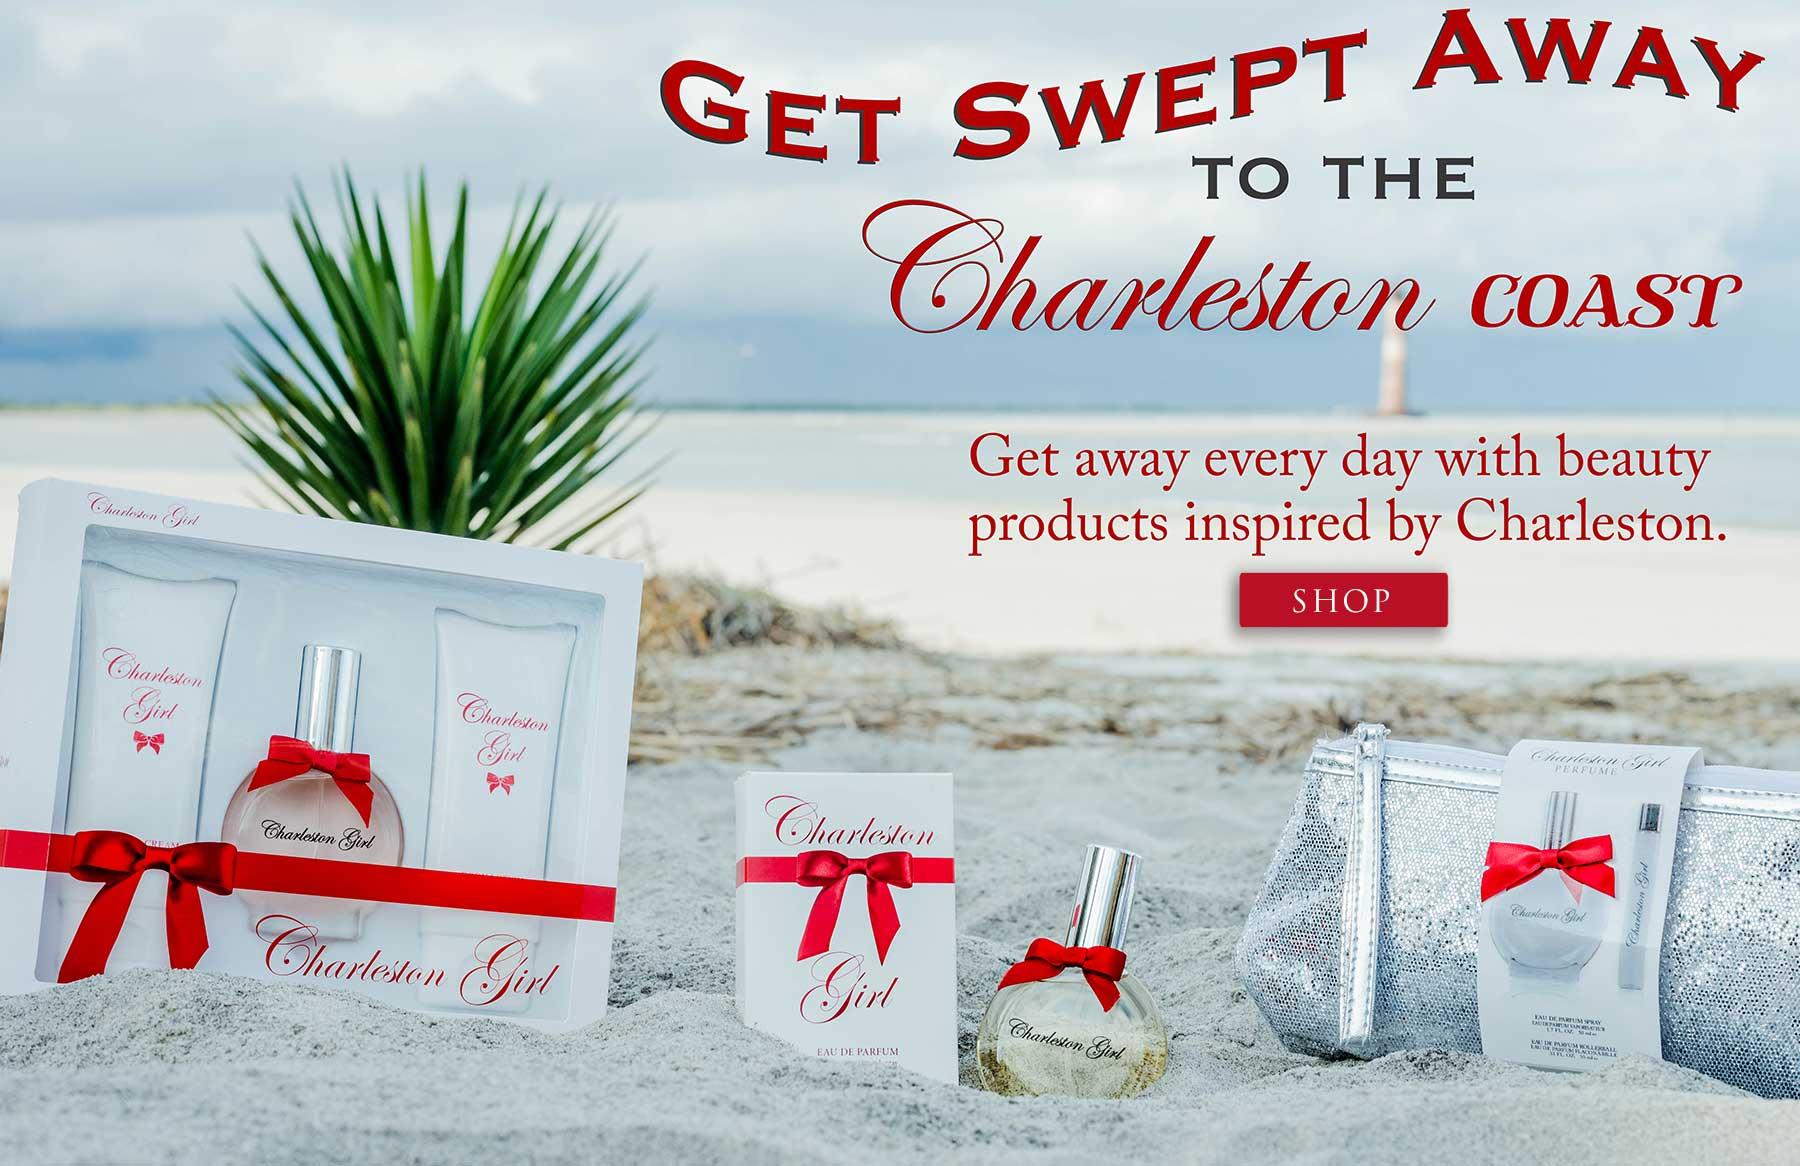 Charleston Girl Perfume Specials